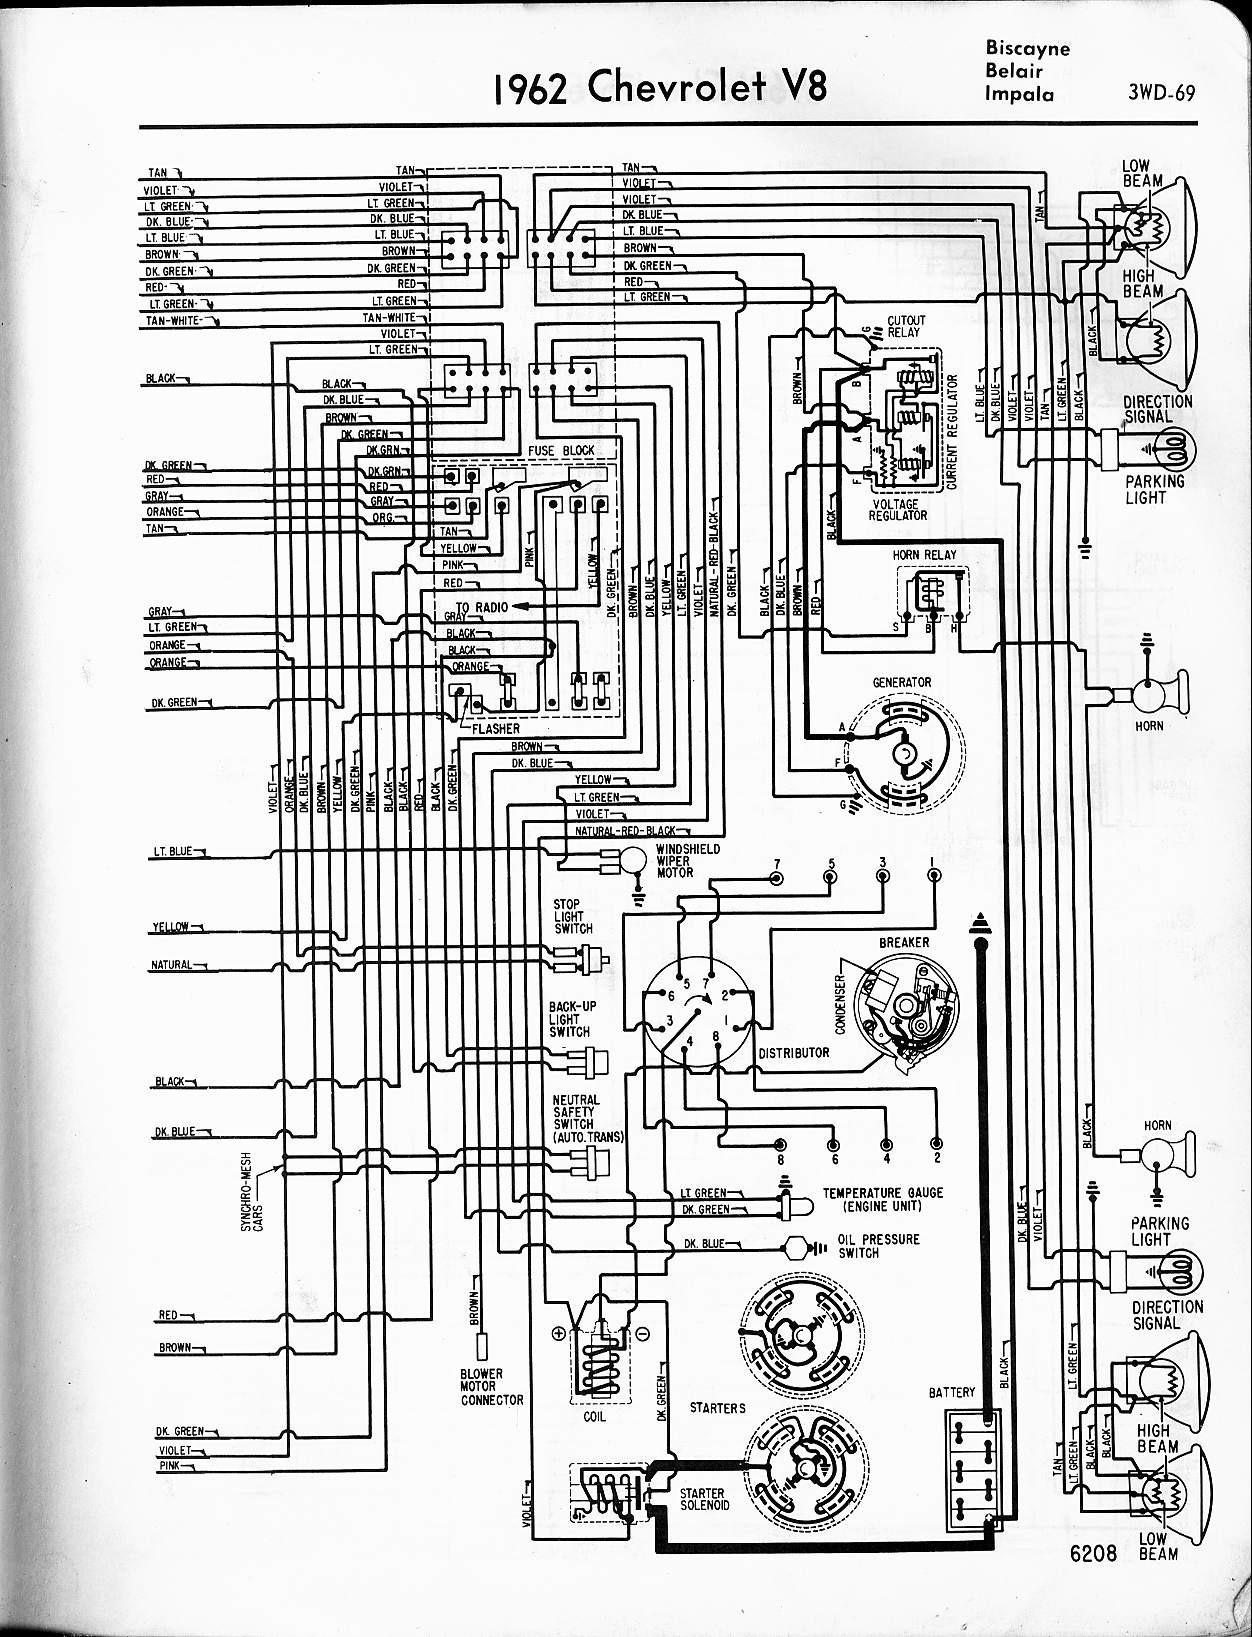 Verizon Wireless Wiring Diagram Schematic Diagrams Chevrolet Sbc Sears Alternator Fios